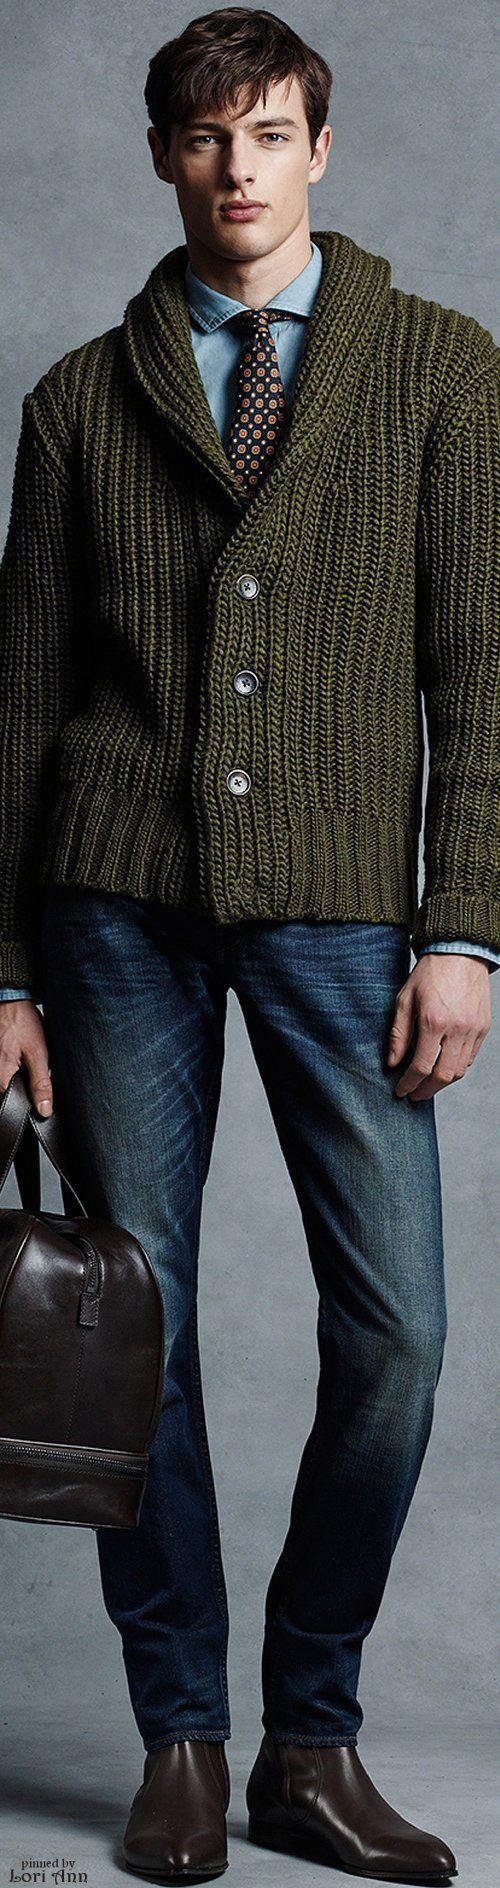 Michael Kors Fall 2015 Menswear | Men's Fashion | Menswear | Business Casual | Cardigan, Tie and Jeans | Moda Masculina | Shop at designerclothingfans.com